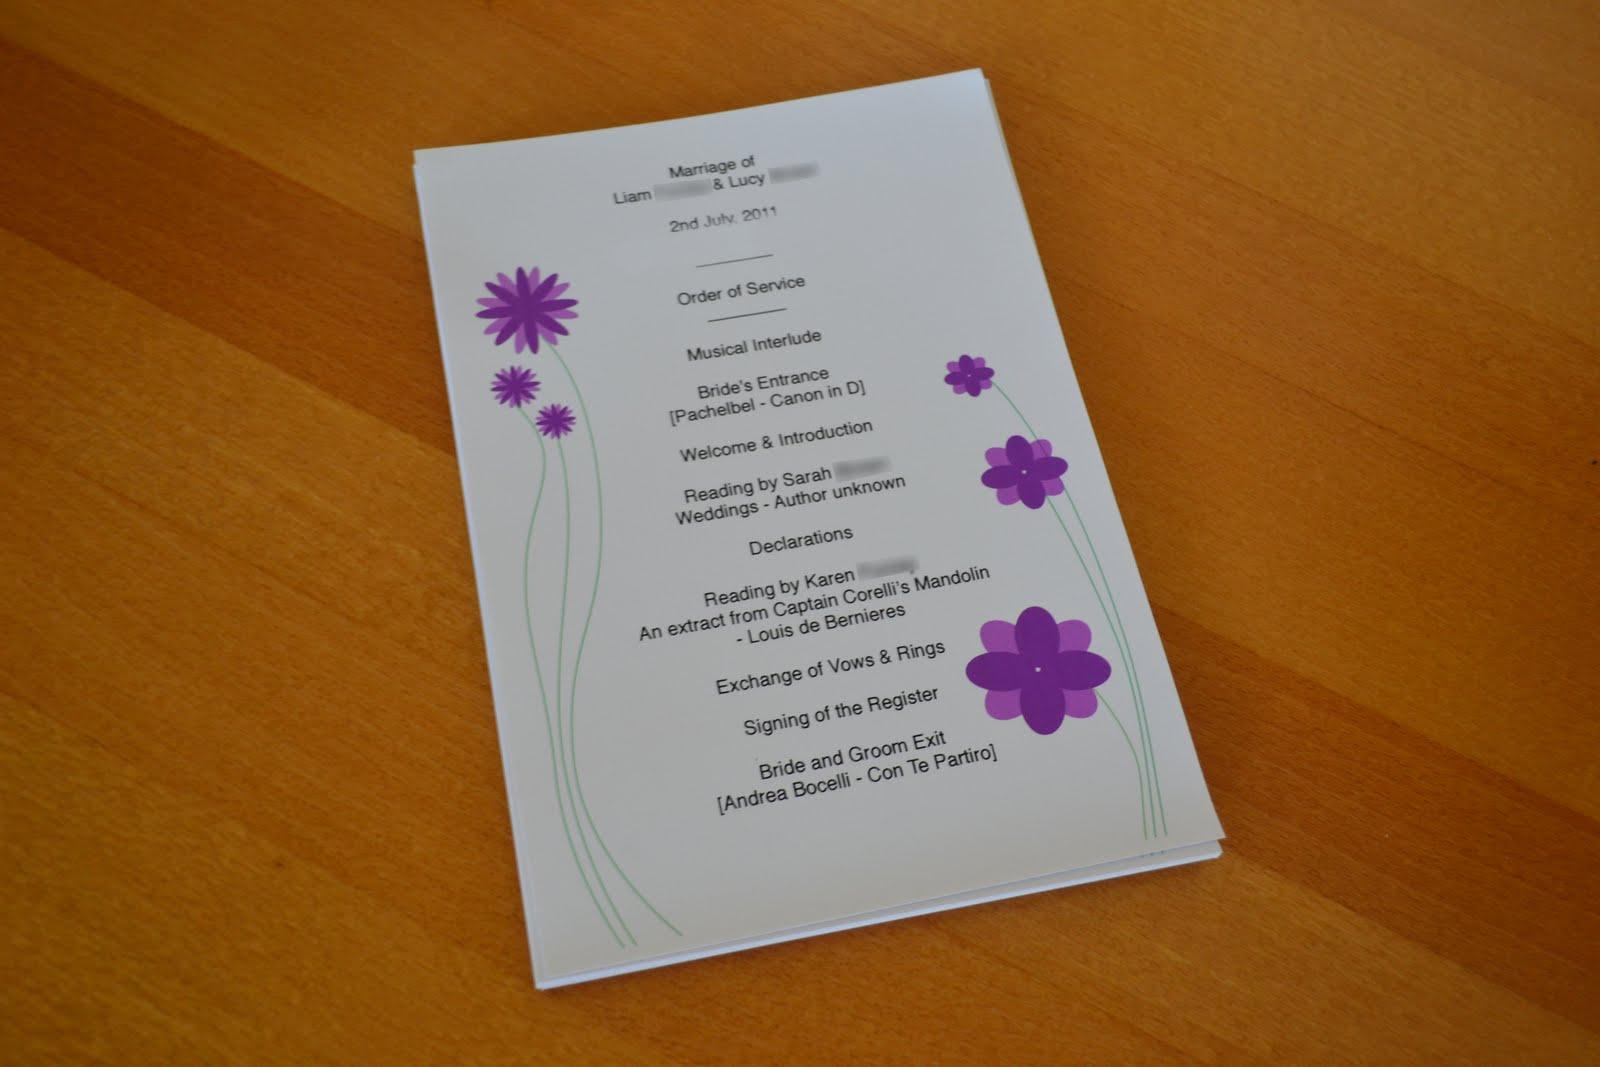 Porridge and Parsnips Wedding Photos The Details